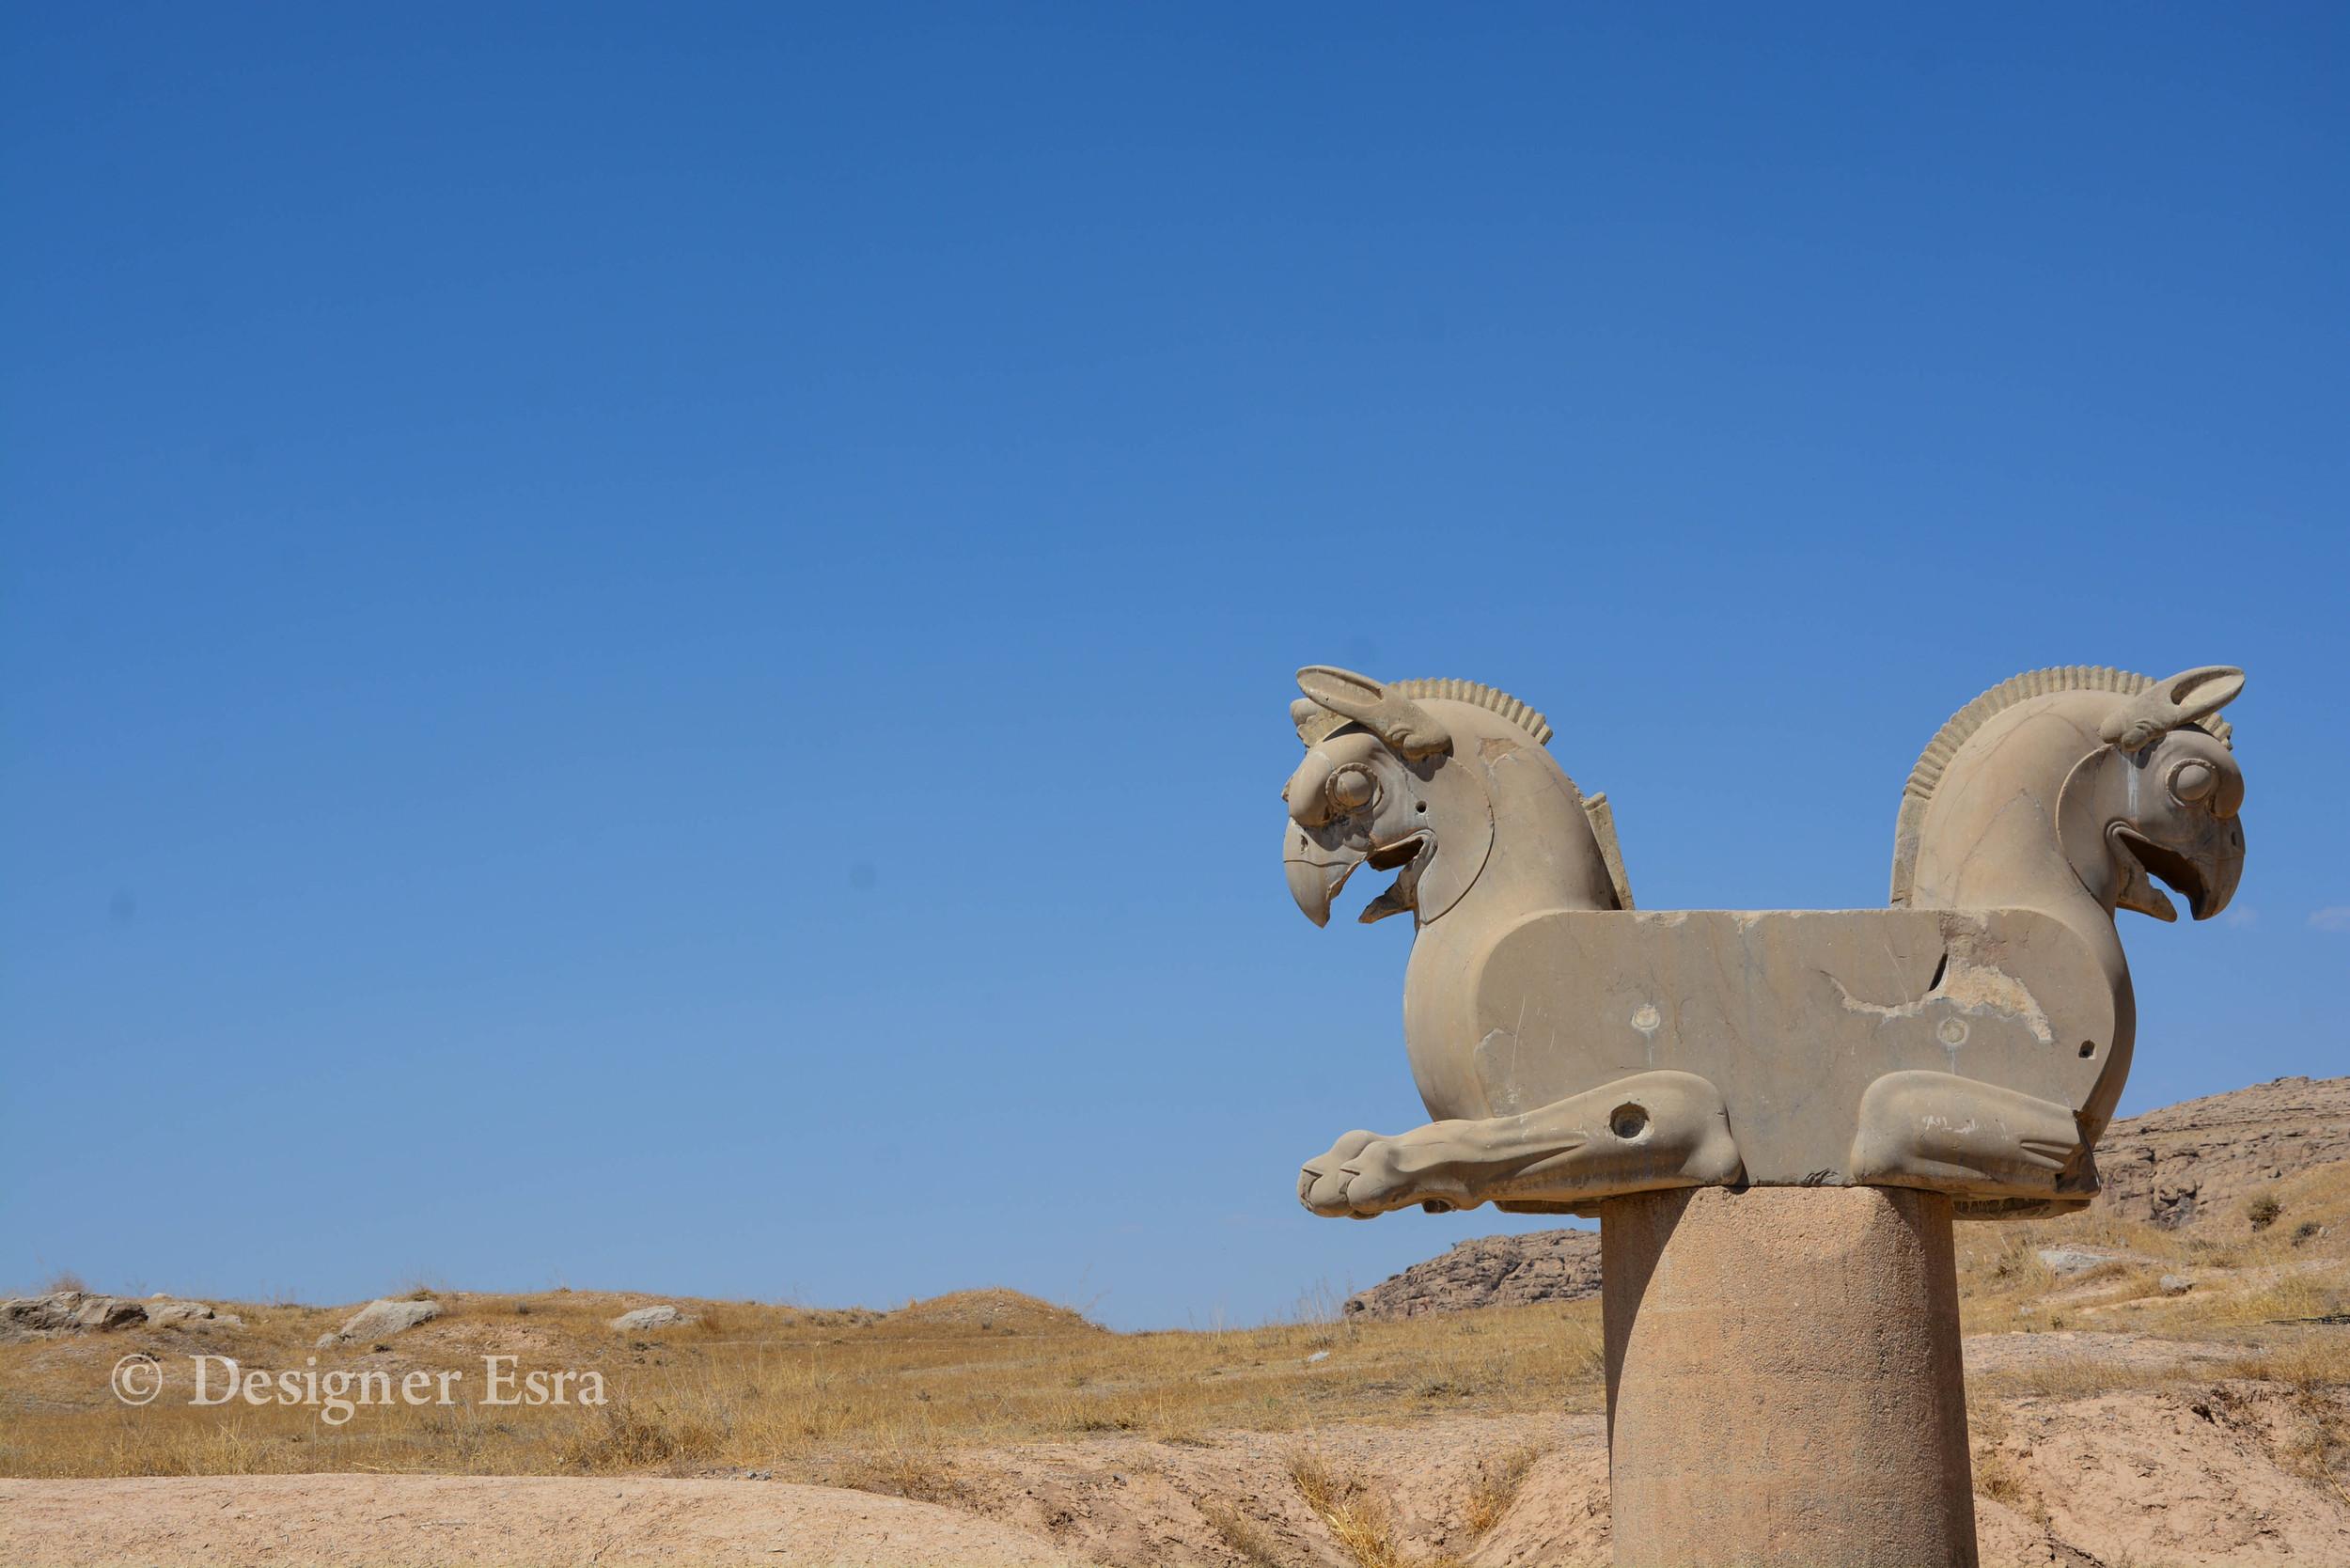 هما Homa, is a mythical bird of Iranian legends (Griffin-like)